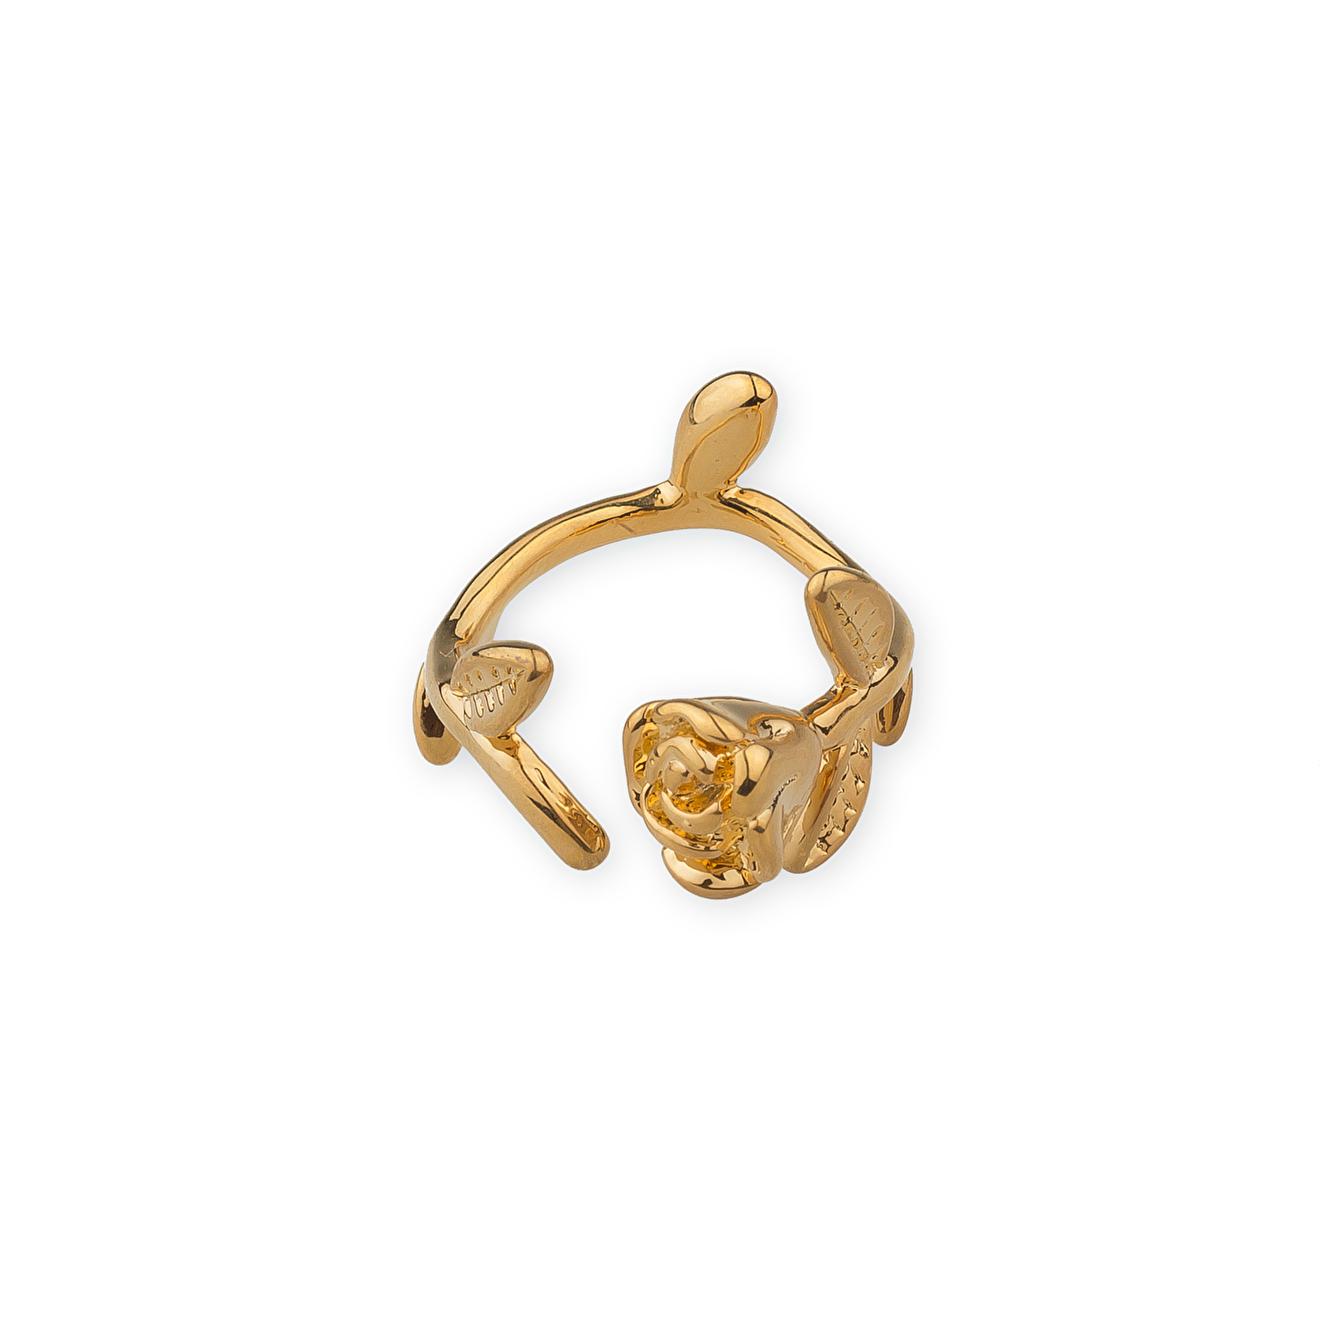 Herald Percy Золотистое кольцо-цветок